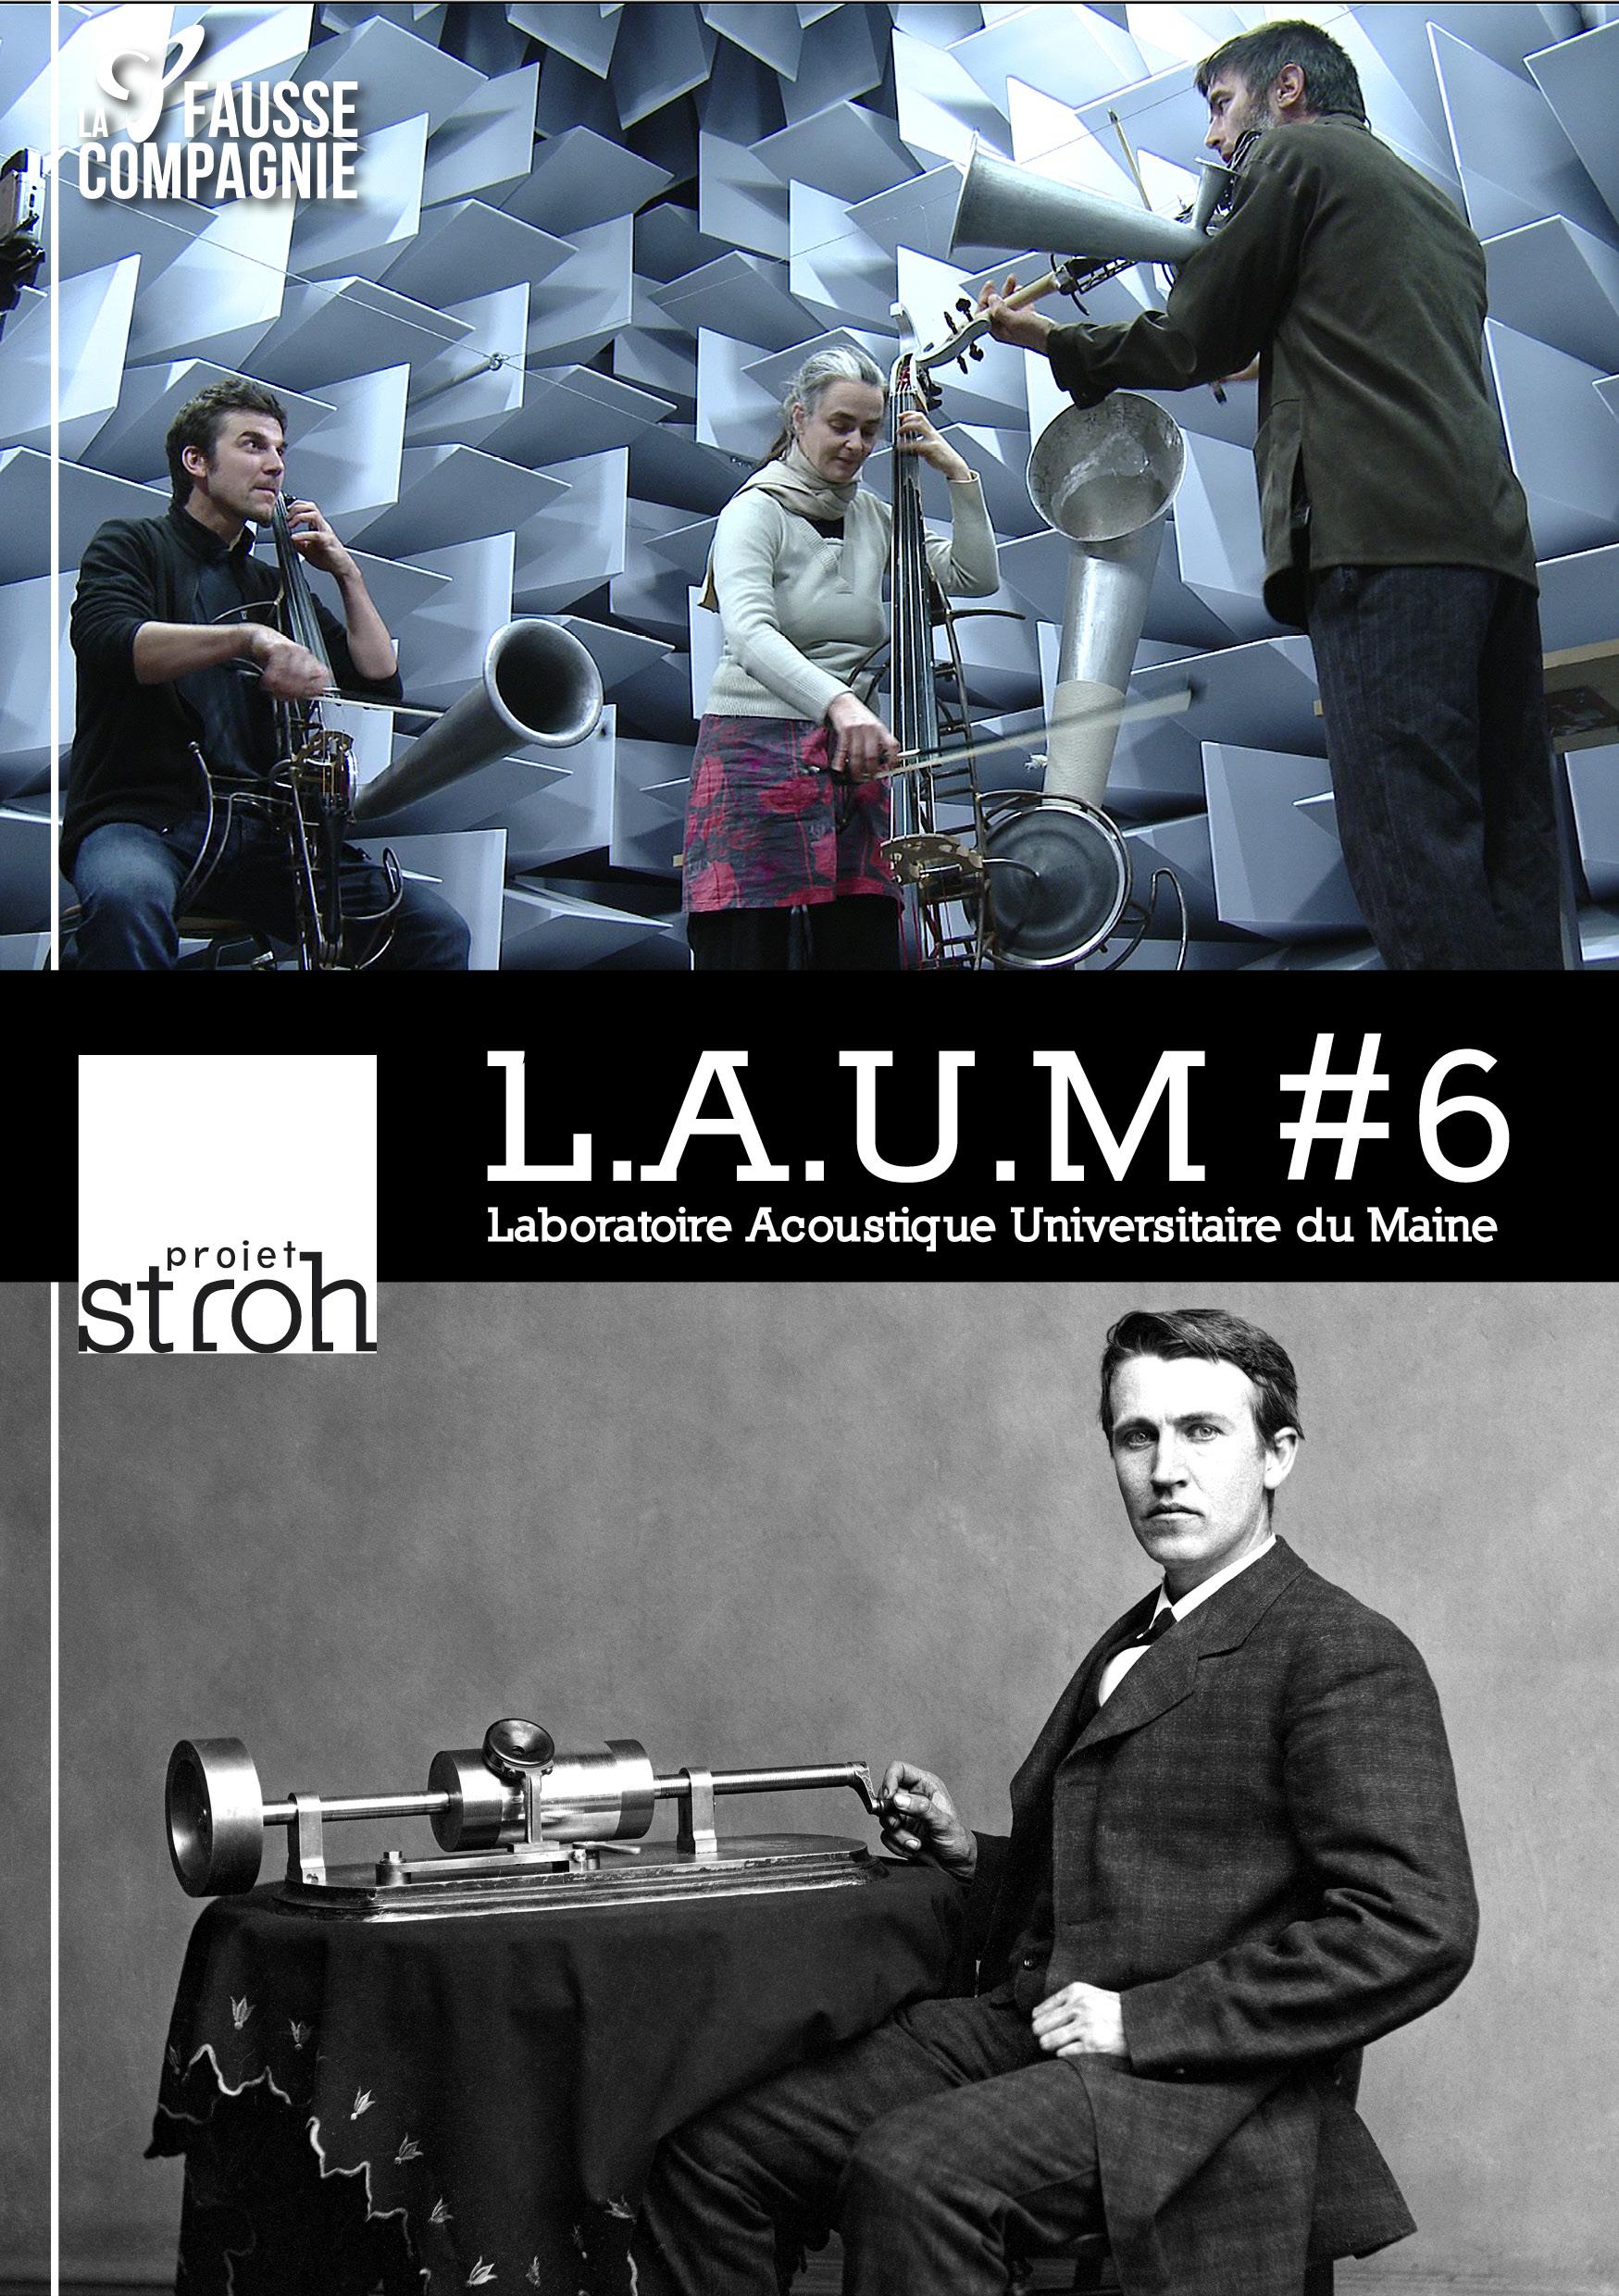 FC_laum_6